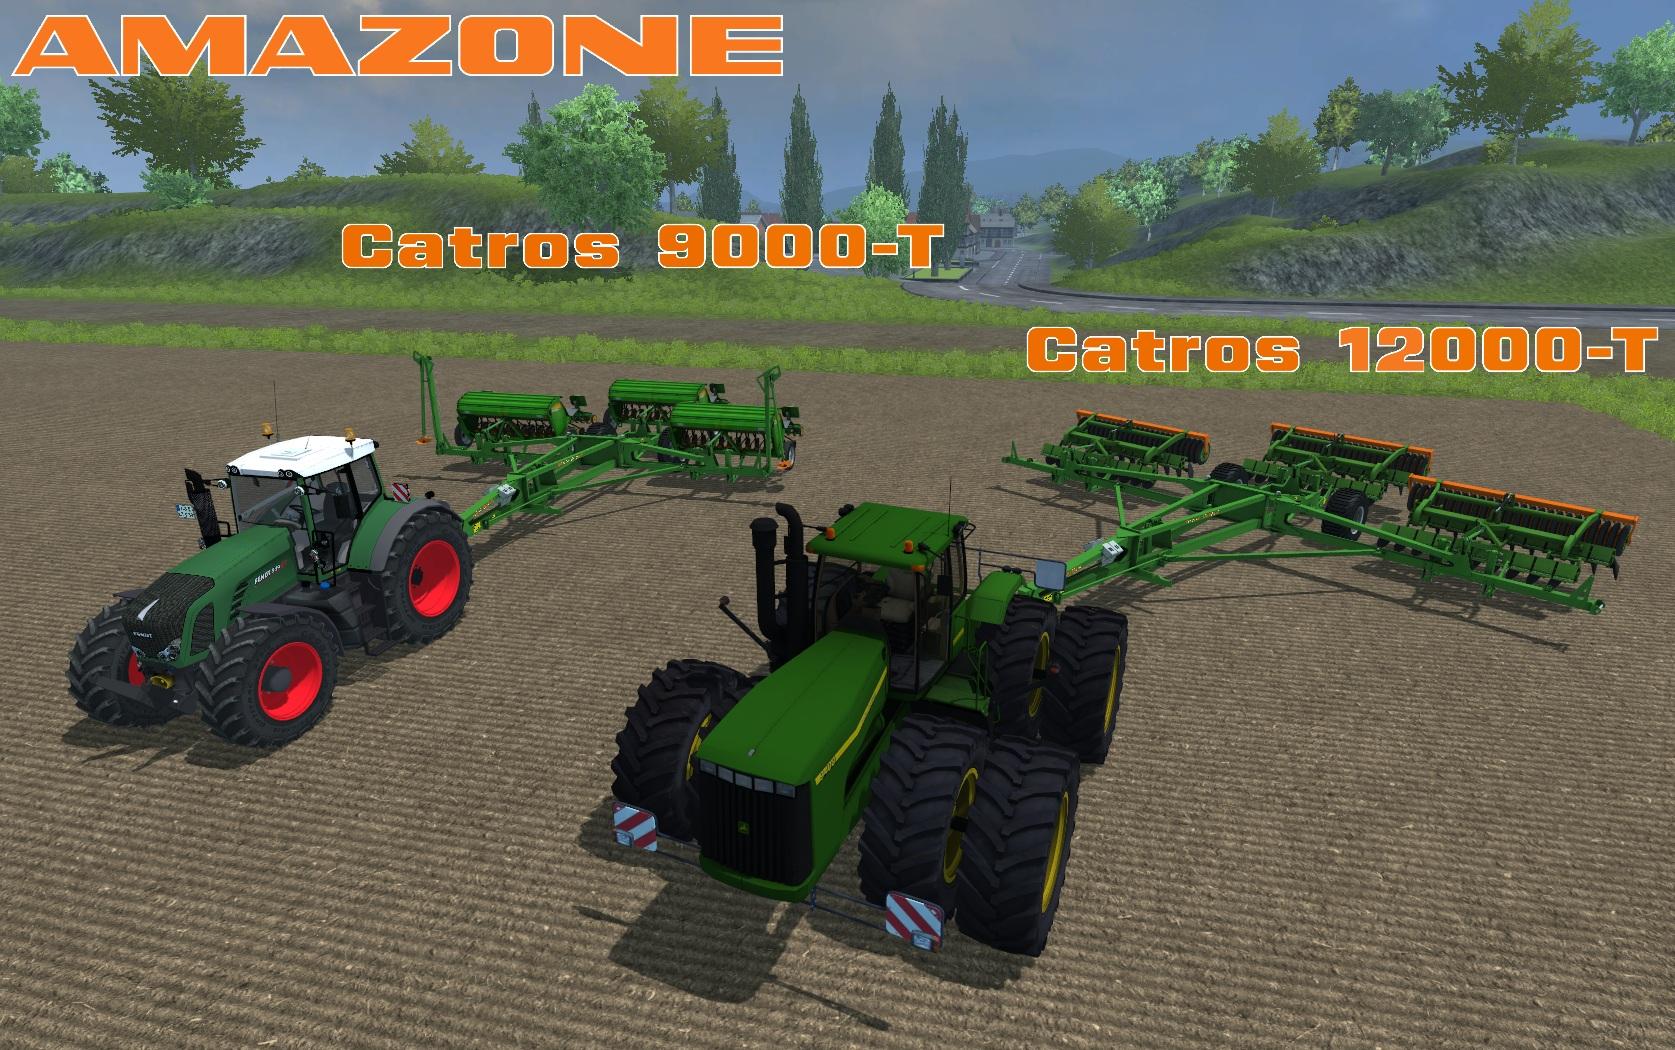 [T.E.P.] Amazone Catros 9000-T y 12000-T Fsscreen_2013_04_17_29ib5b